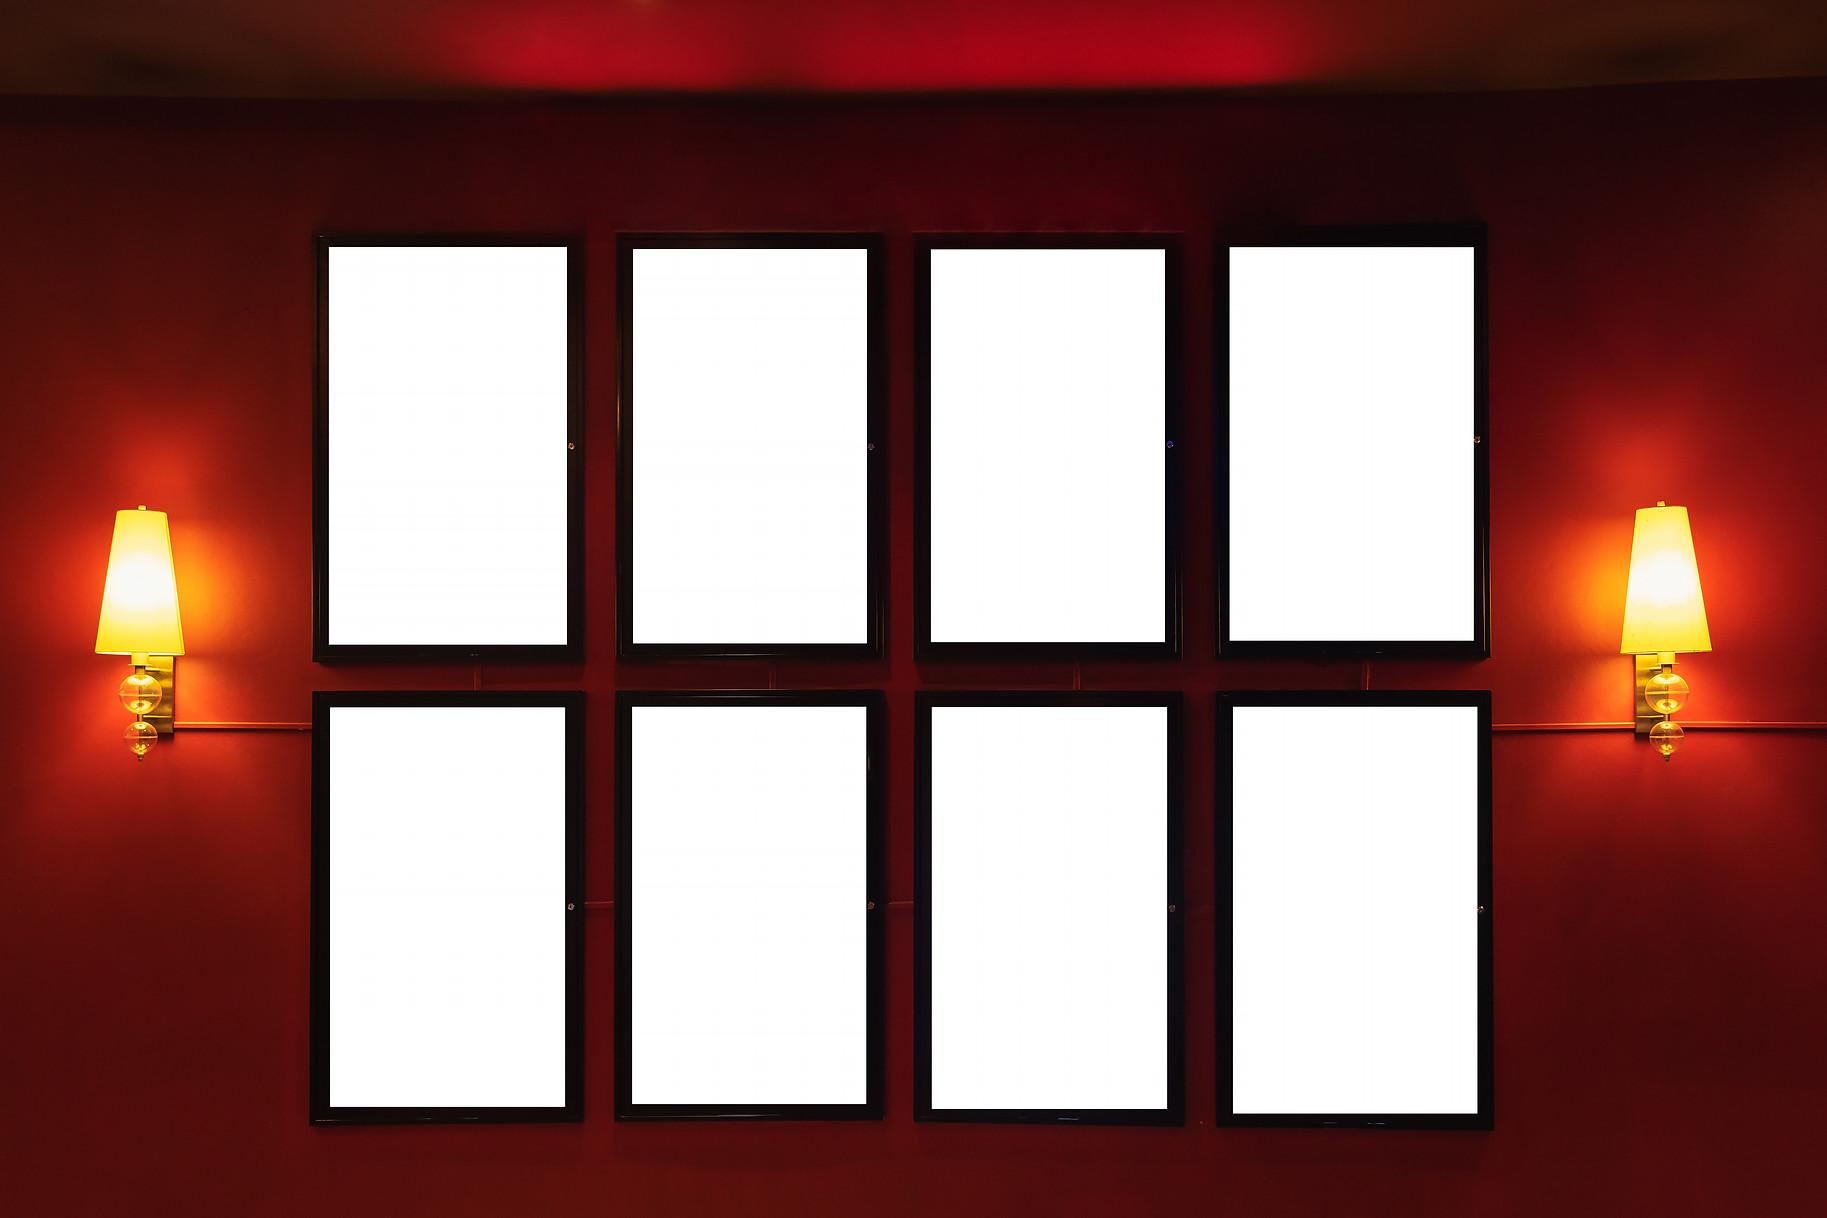 Movie poster cinema light box or Display frame cinema lightbox or billboards with white bl